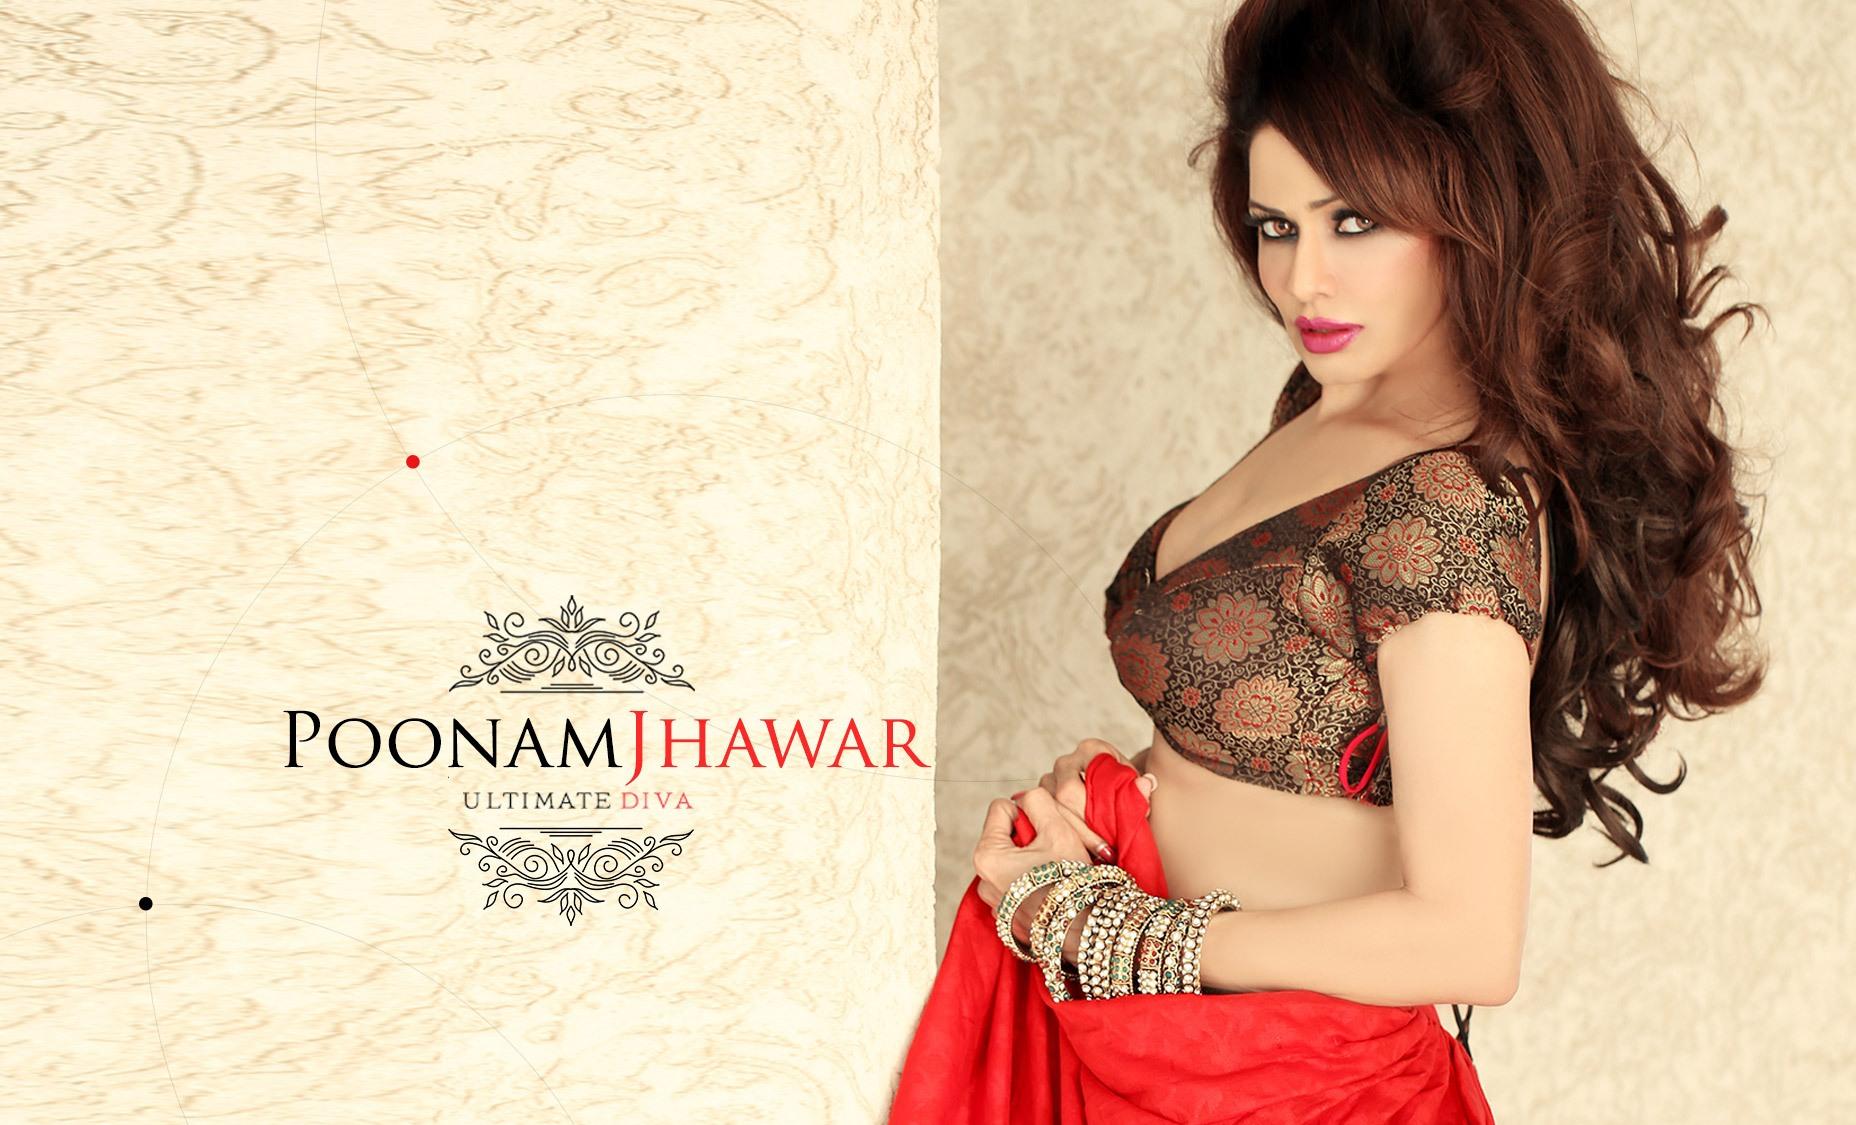 Poonam-Jhawar-Hot-saree-wallpapers